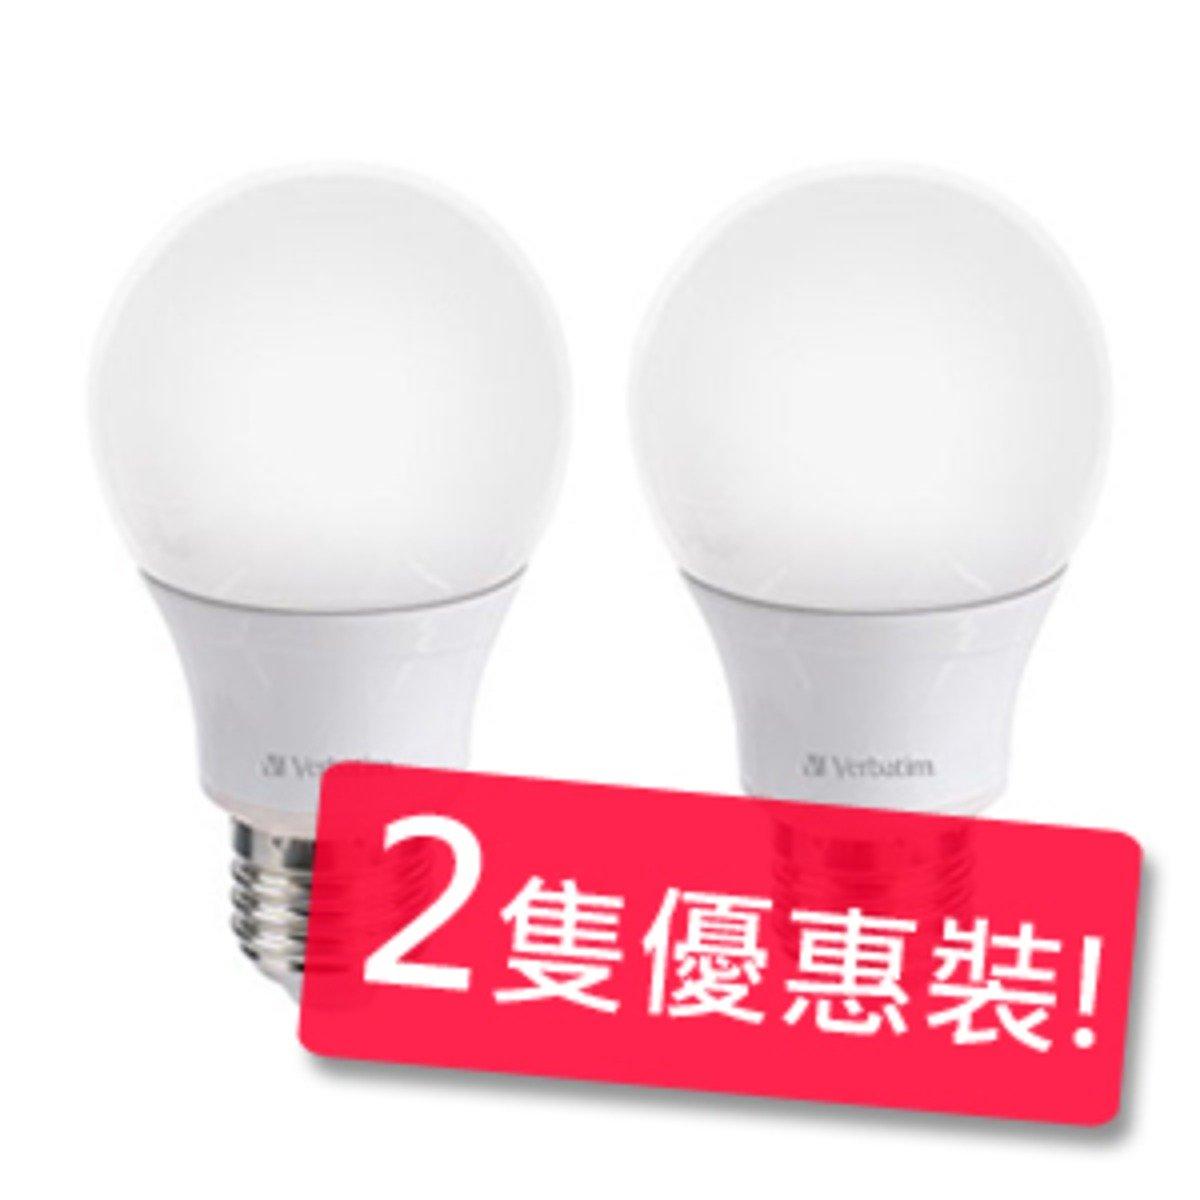 Verbatim 6瓦 E27 480lm 3000k 燈泡 (暖白) 2隻優惠裝